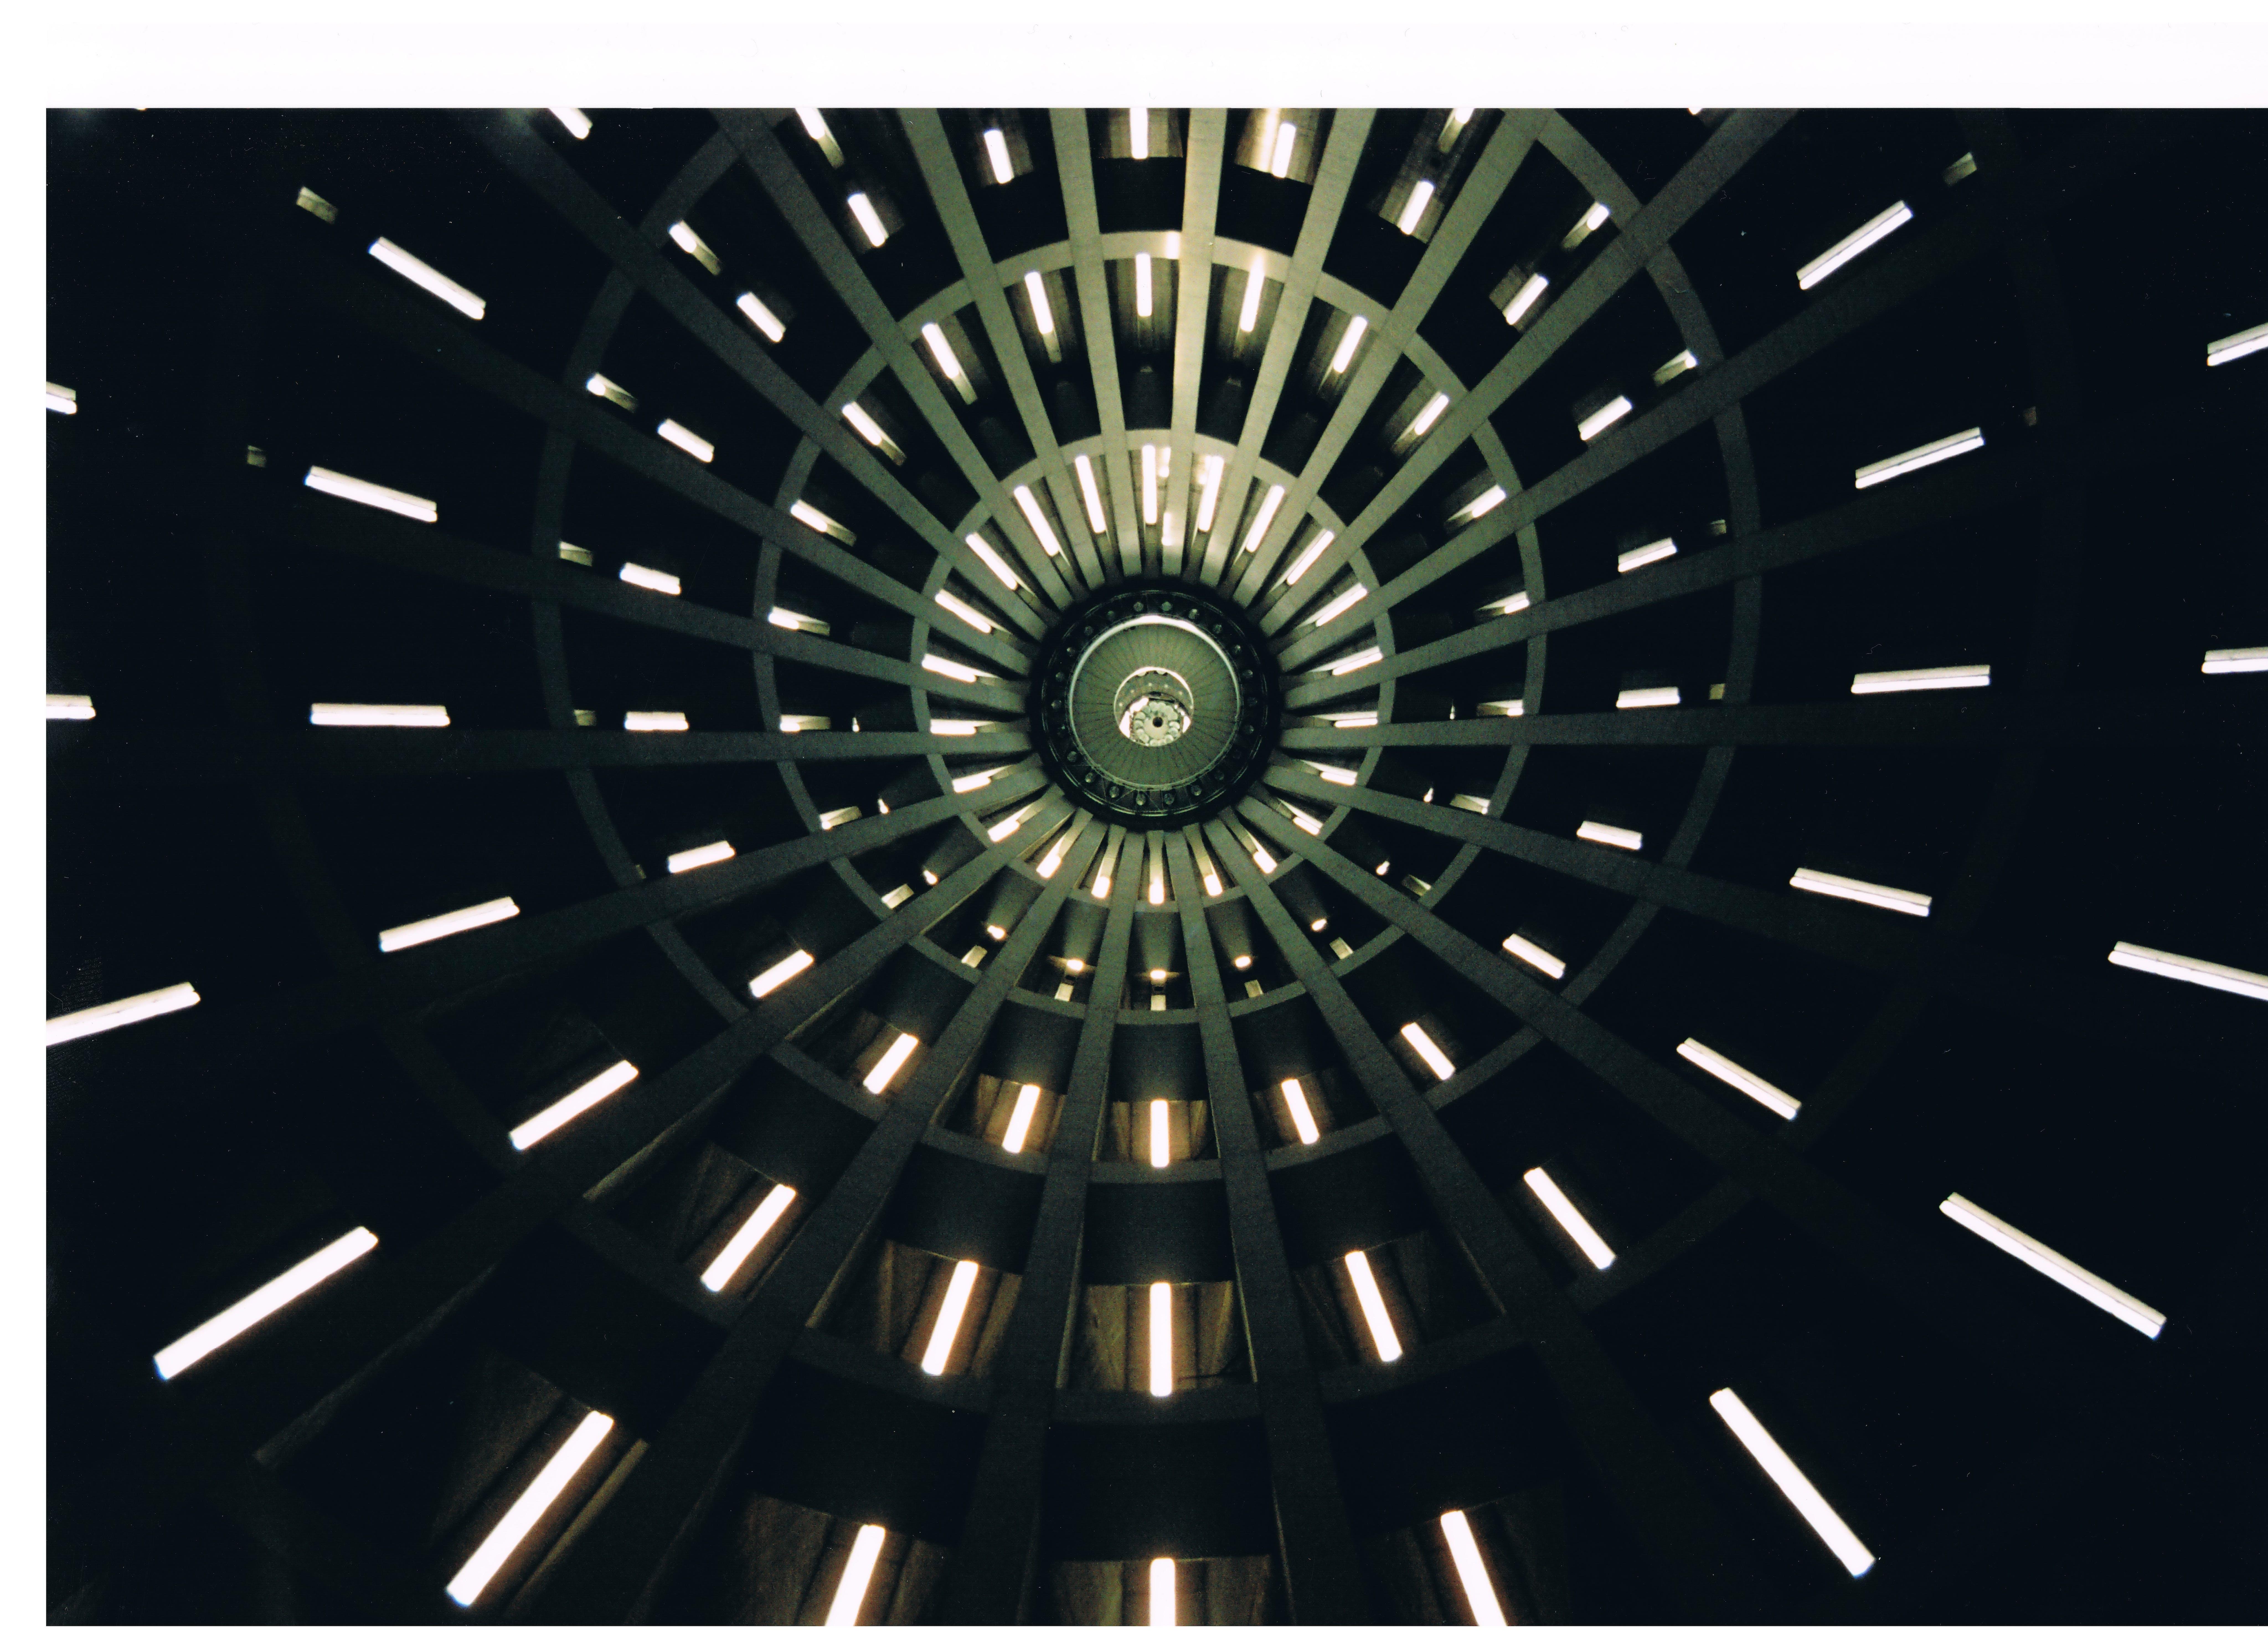 Kostenloses Stock Foto zu abbildung, abstrakt, beleuchtung, design